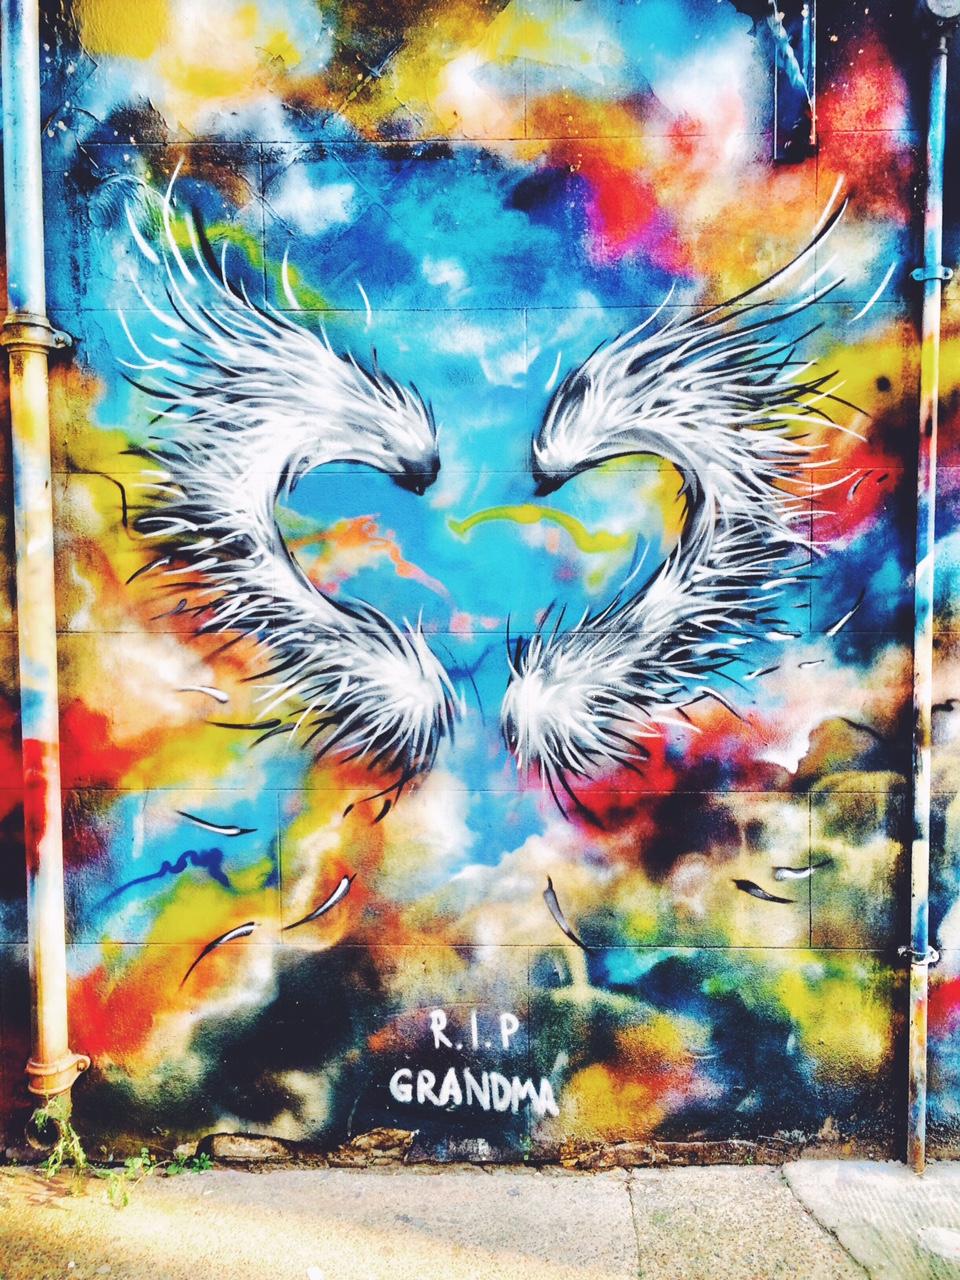 R.I.P. grandma graffit